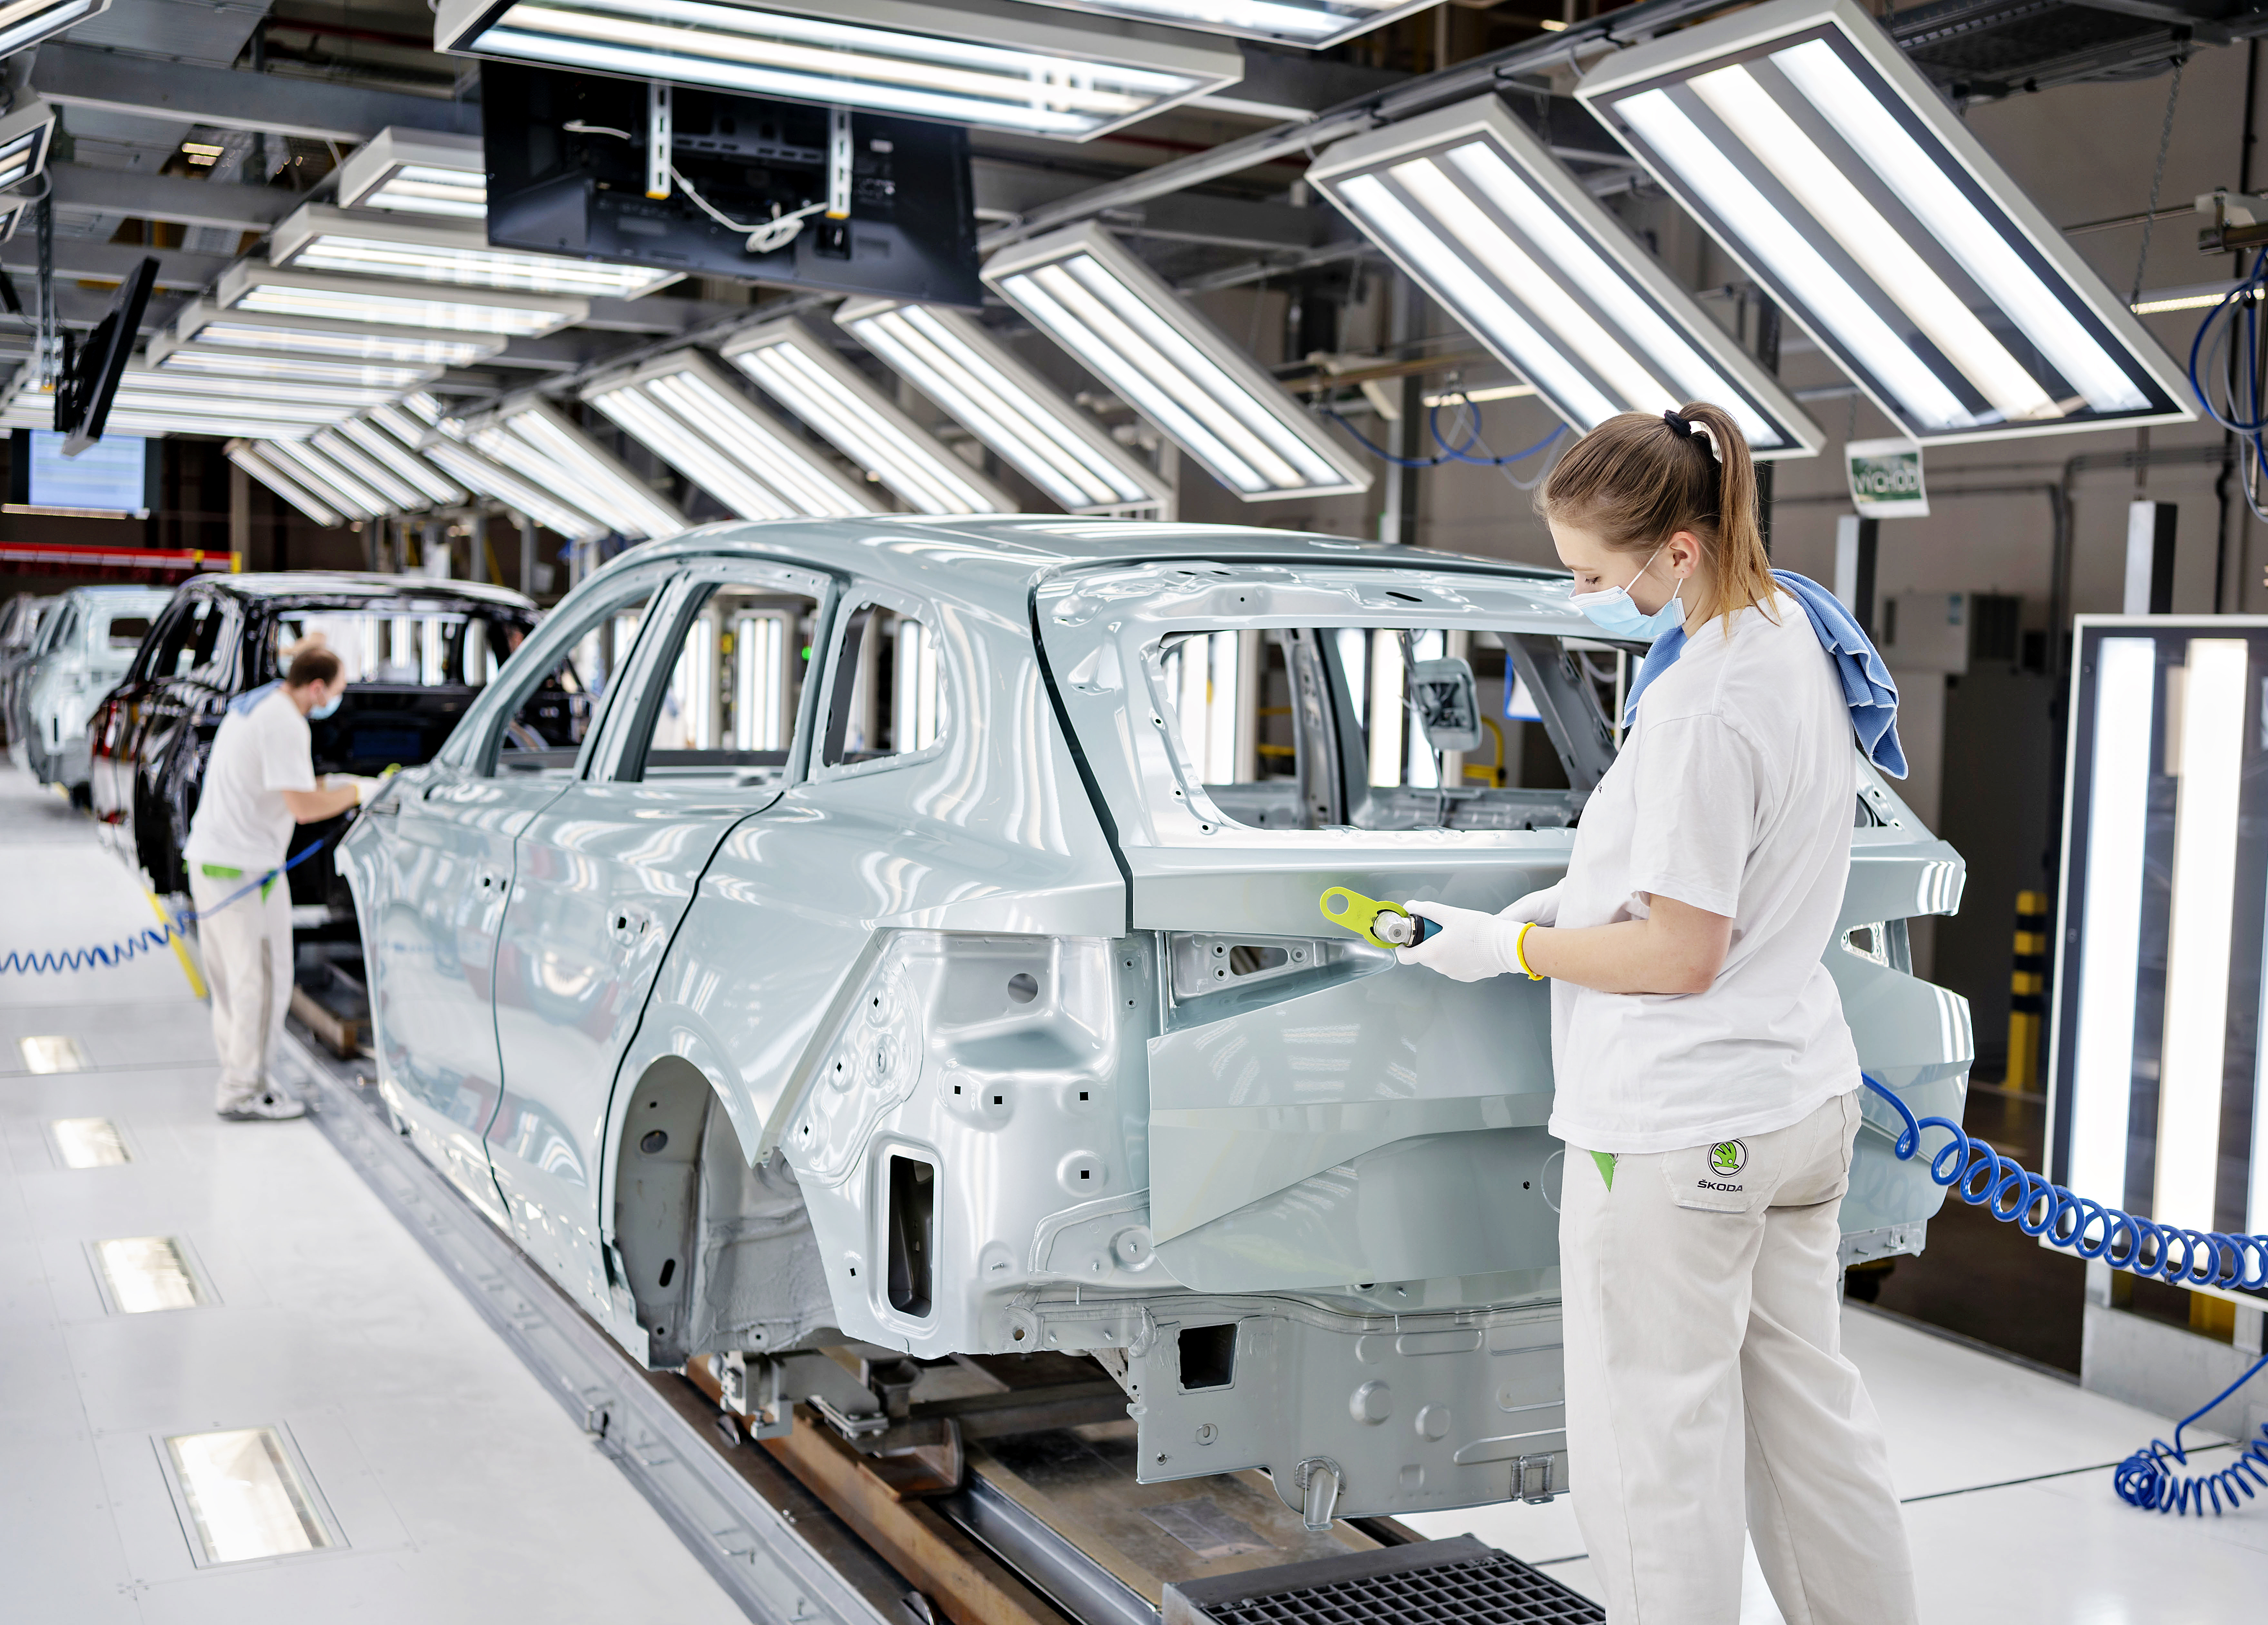 SKODA AUTO manufactures 100,000th iV vehicle - Image 1